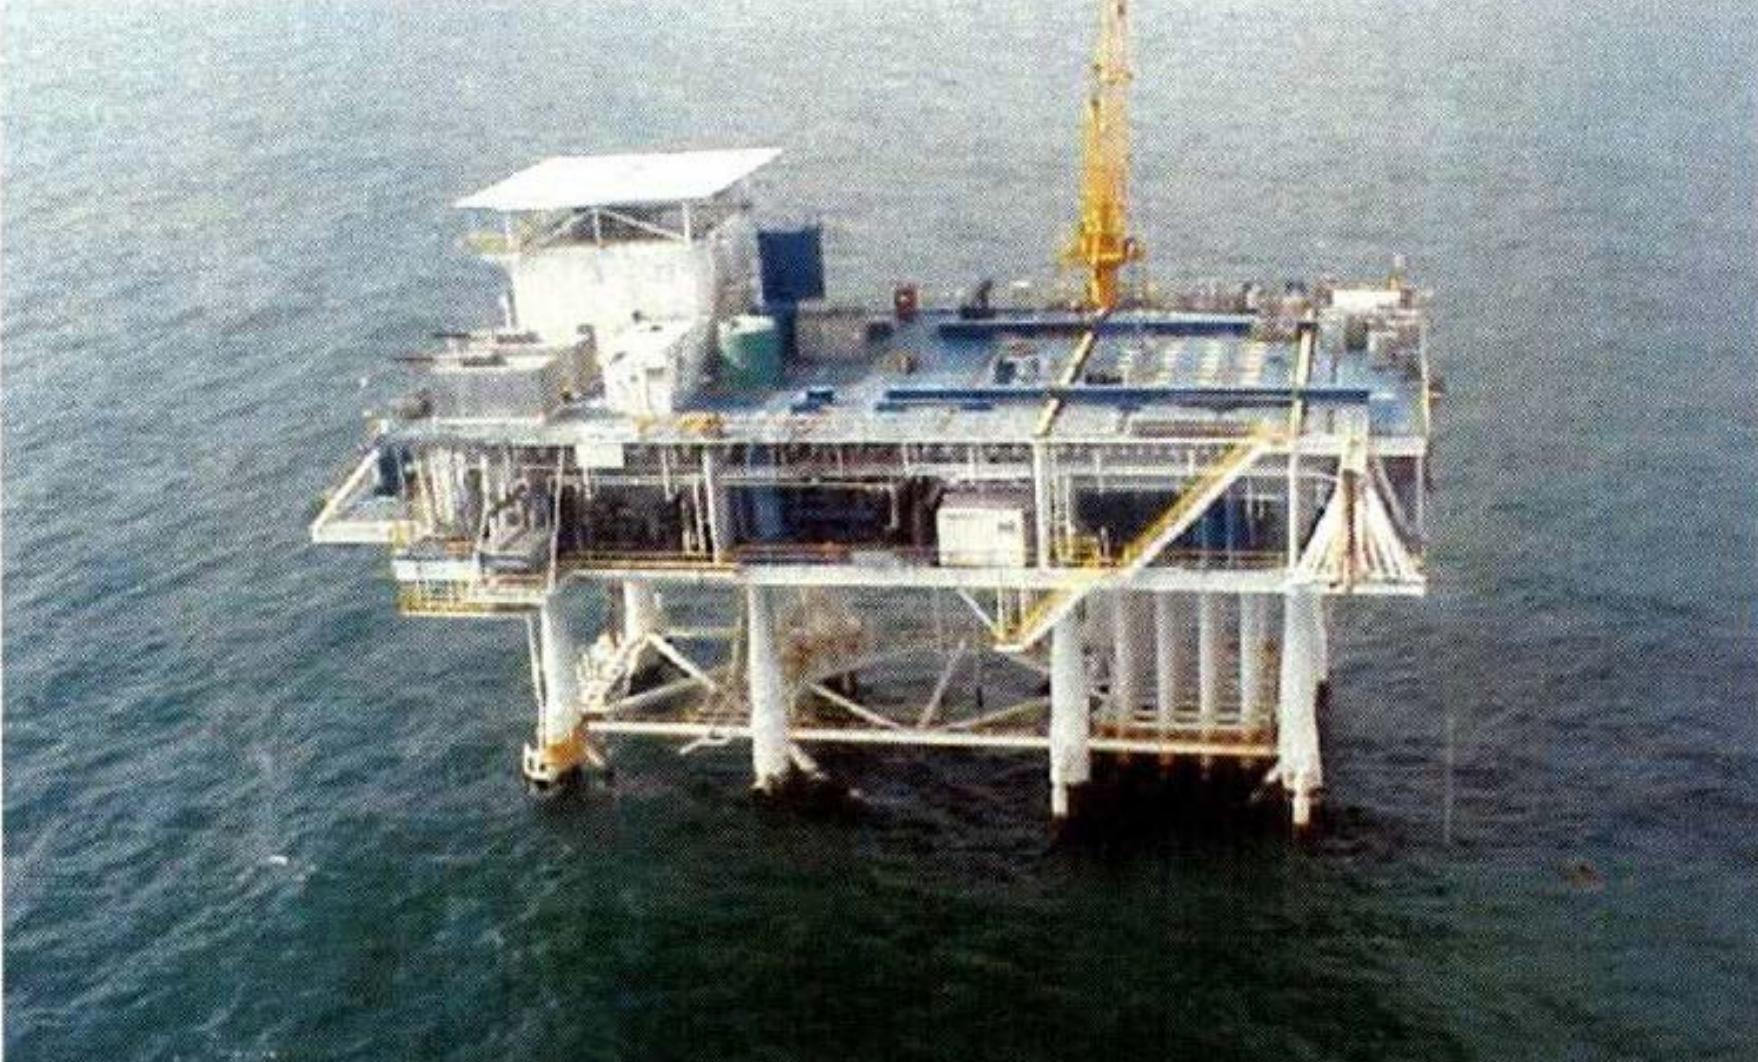 Taylor Energy Platform #23051